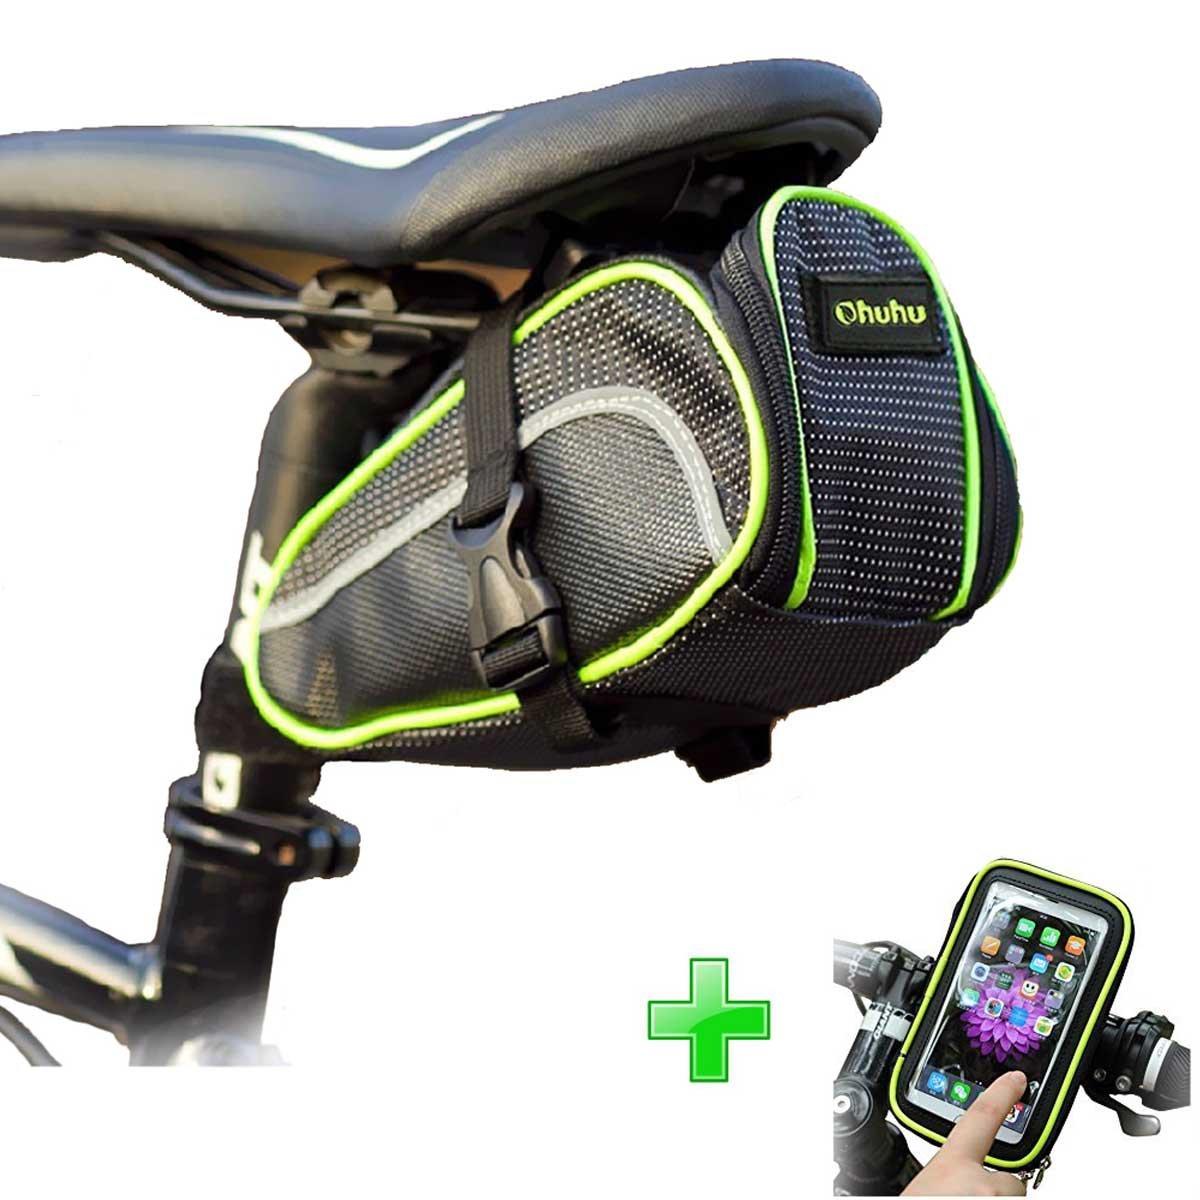 Ohuhu Bicycle Strap-on Saddle Bag / Seat Bag + Bike Phone Holder Bag